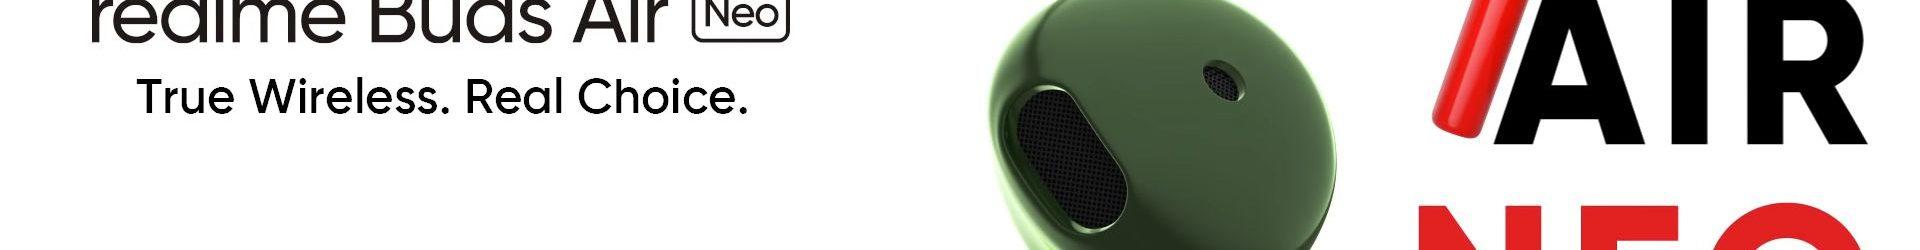 Realme Buds Air Neo ufficiali: auricolari Bluetooth in stile AirPods